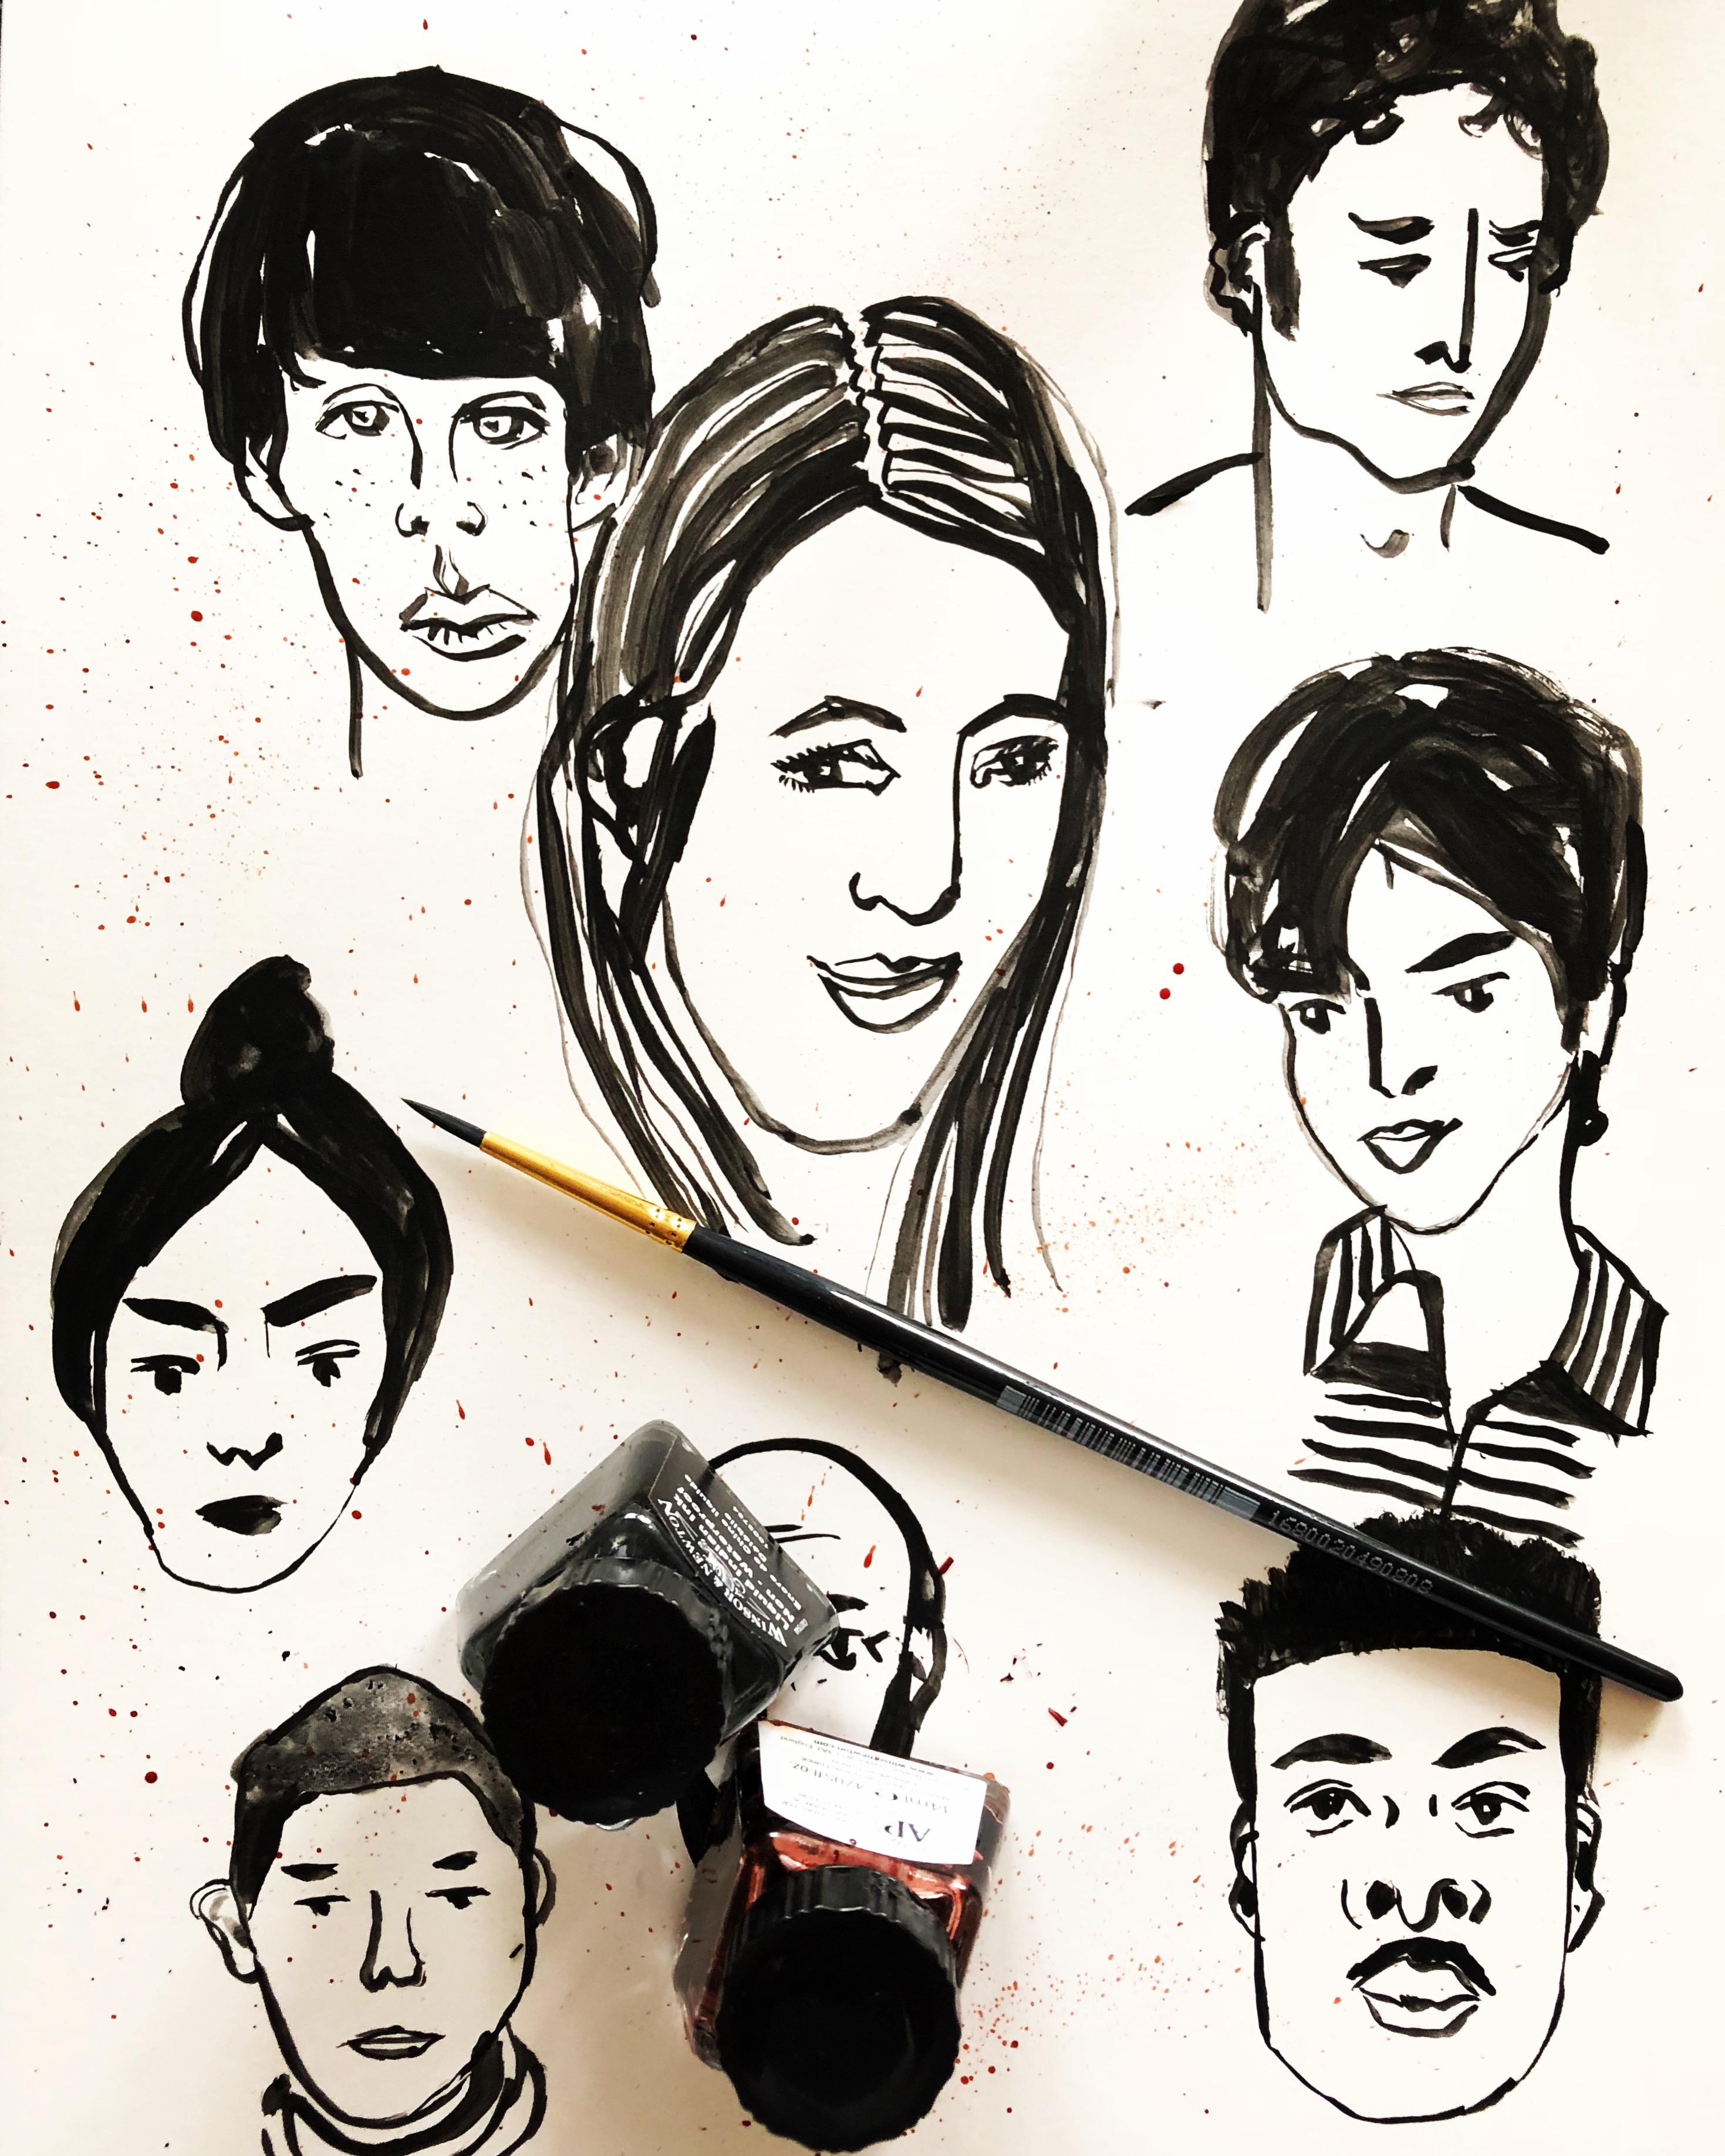 Ink sketch by Alison Garwood-Jones